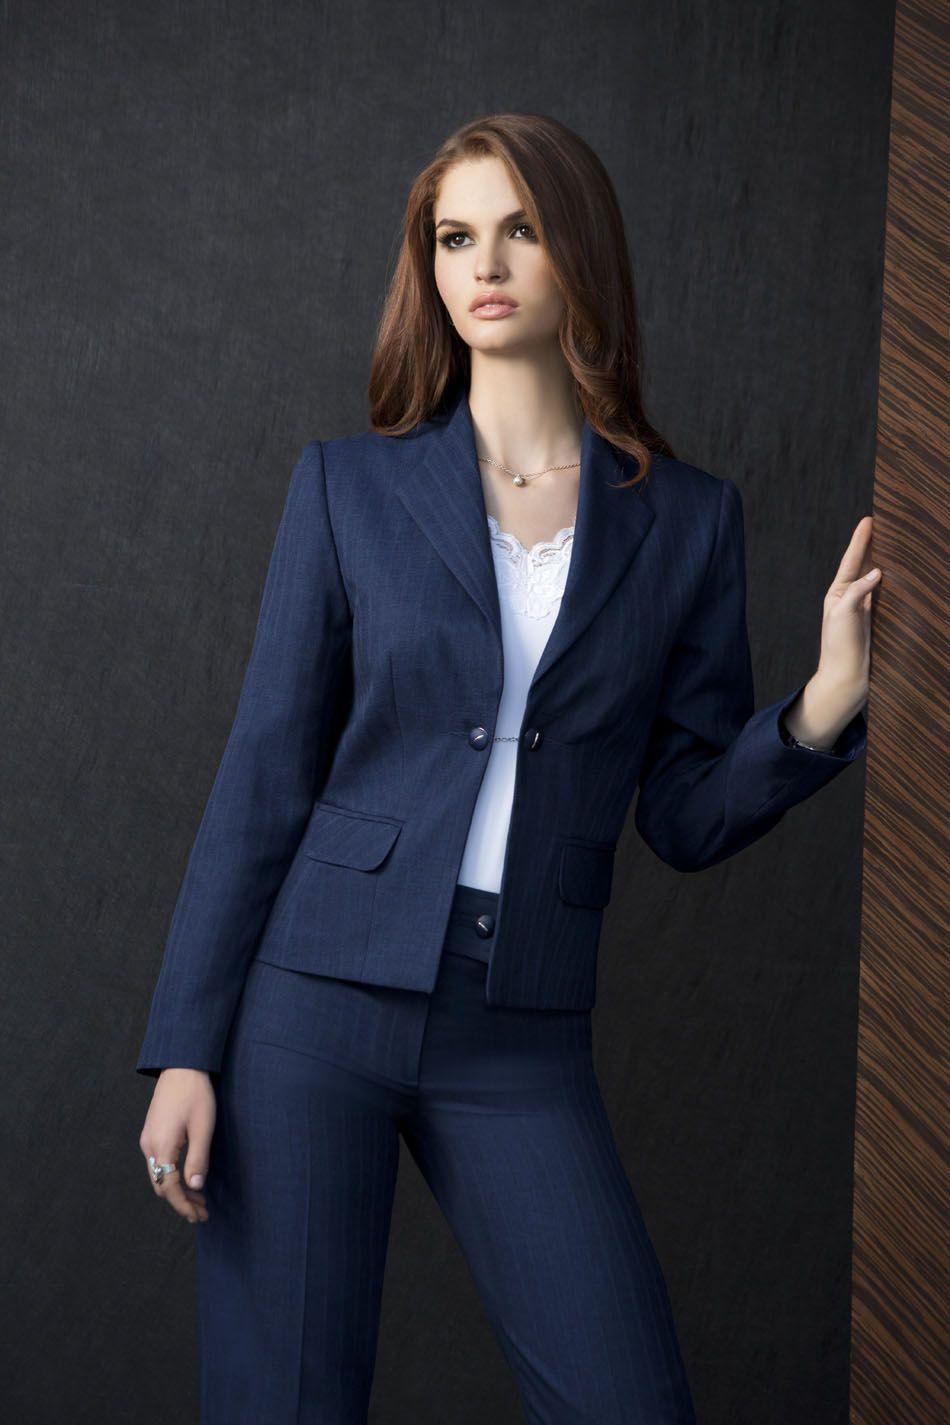 Vanity Uniformes Redirect Casual Work Attire Job Clothes Lawyer Fashion